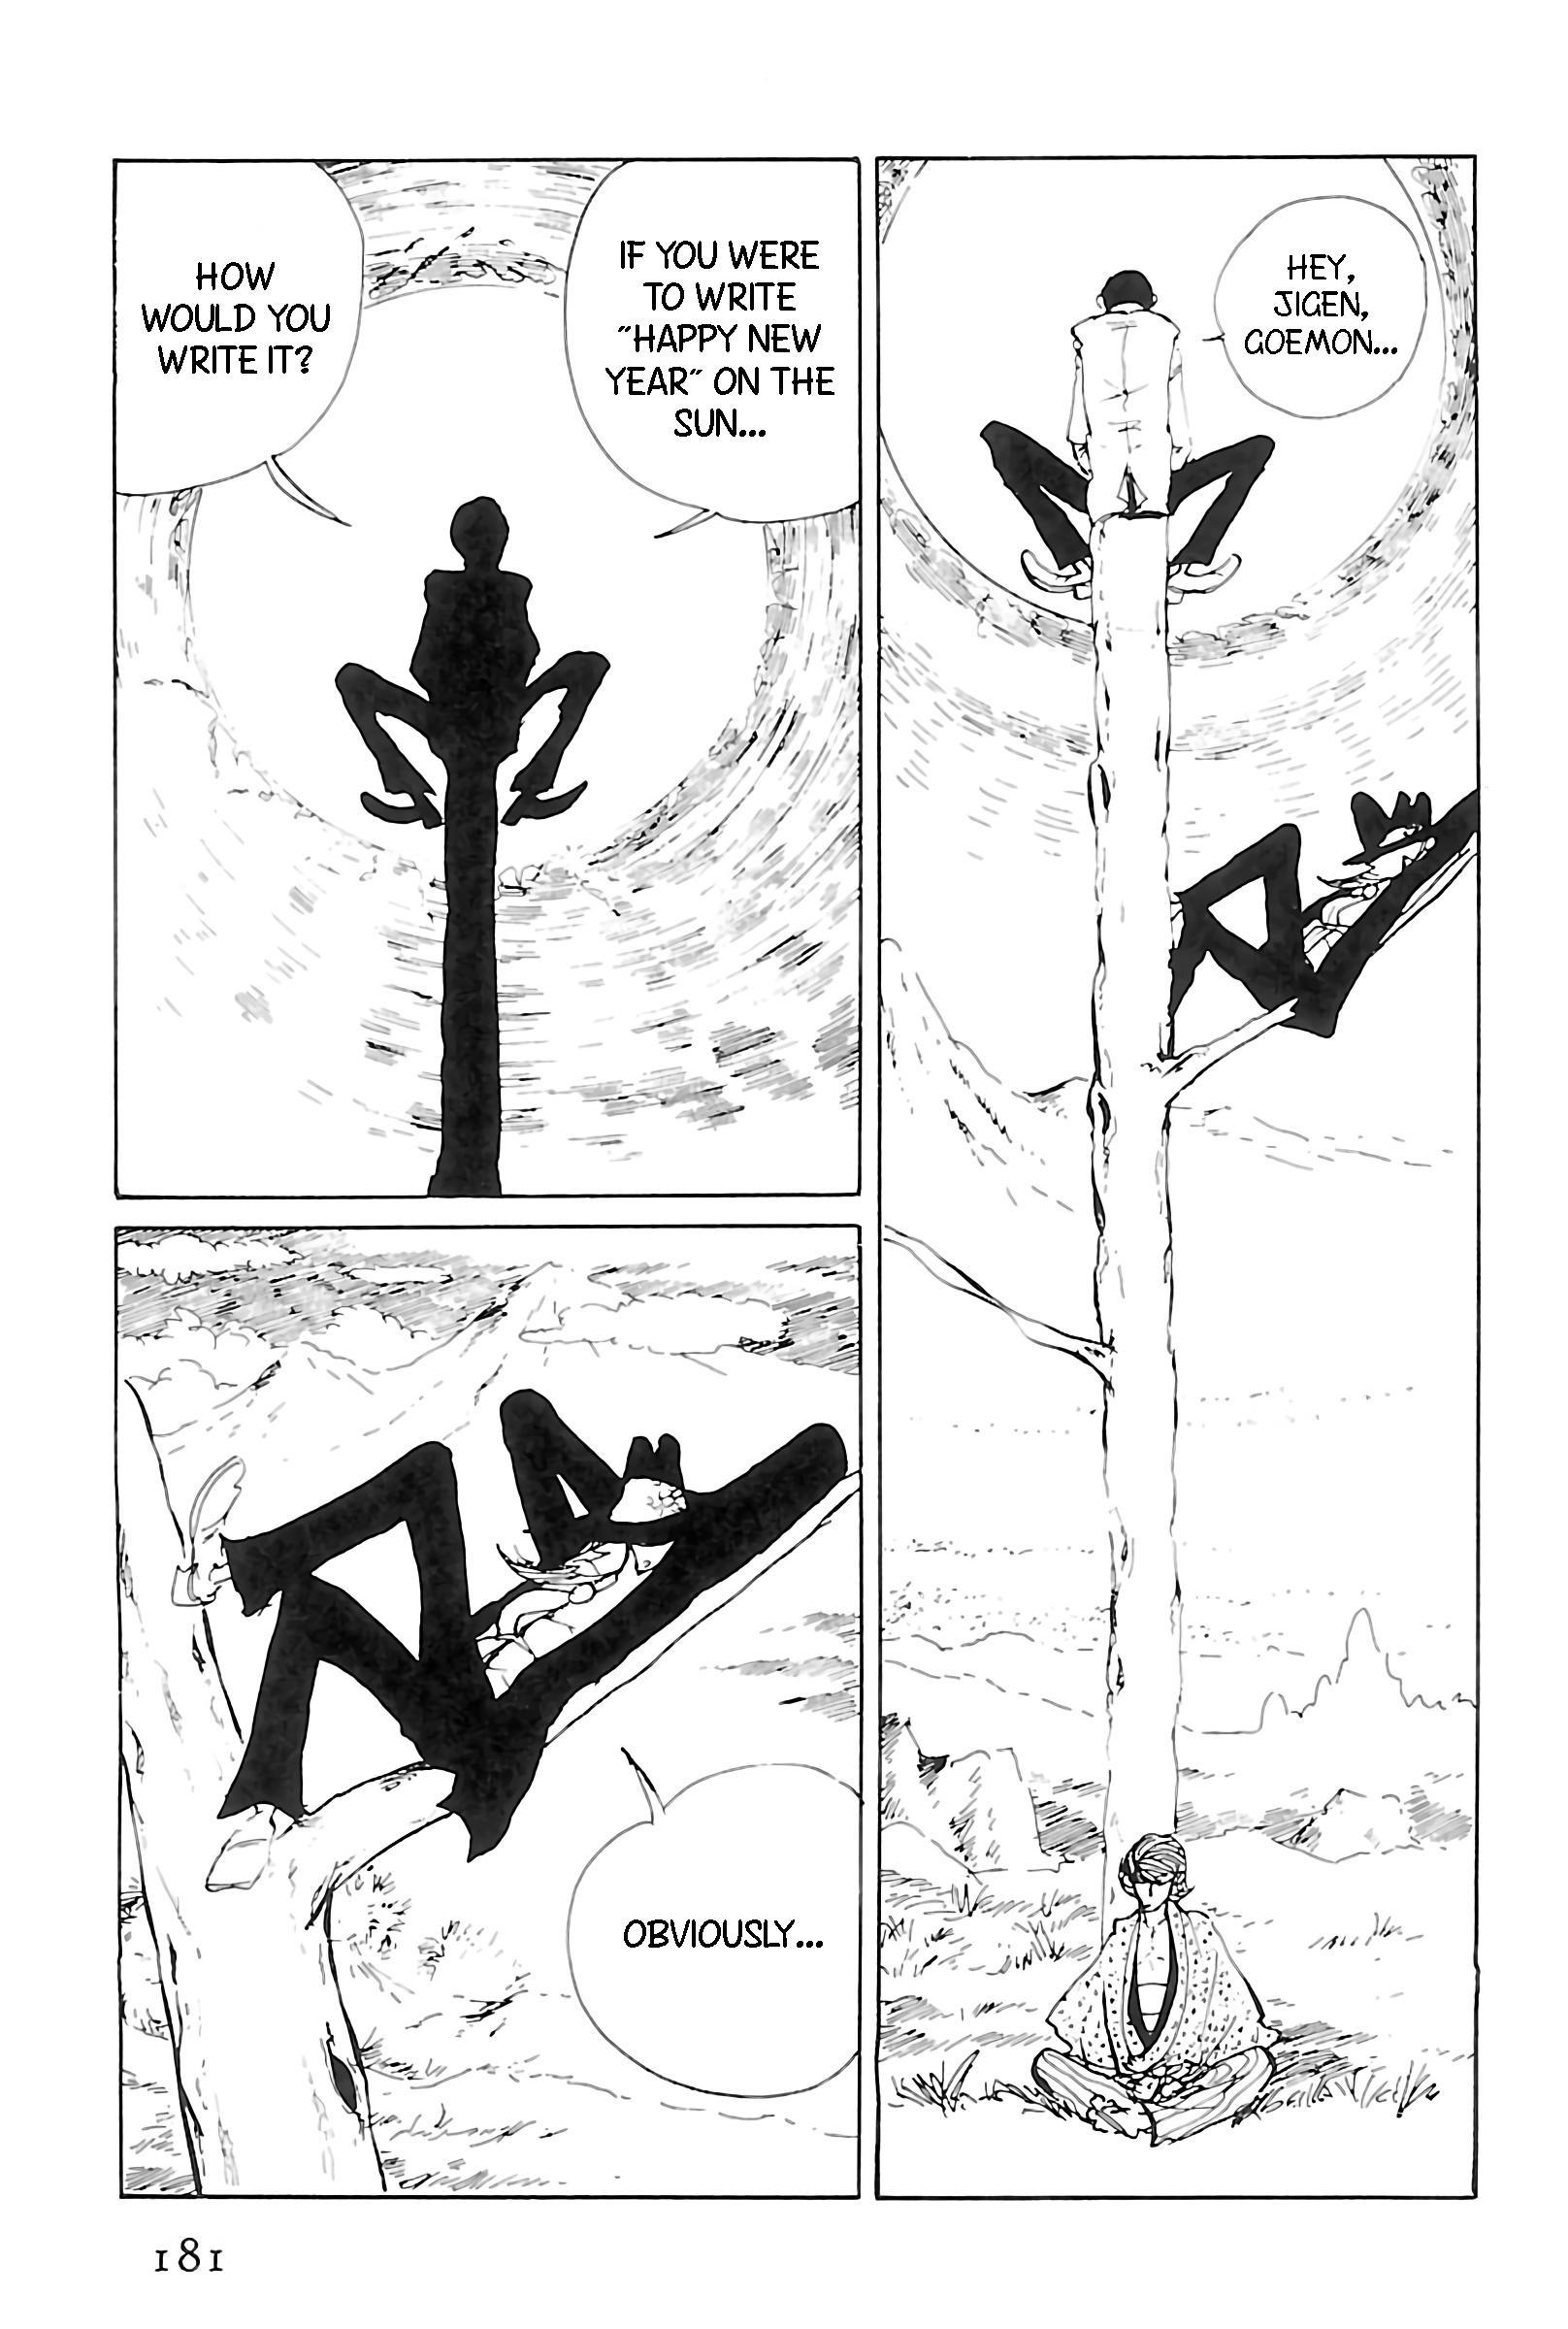 Lupin Iii: World'S Most Wanted Vol.11 Chapter 124: Happy New Year, Lupin! page 3 - Mangakakalots.com